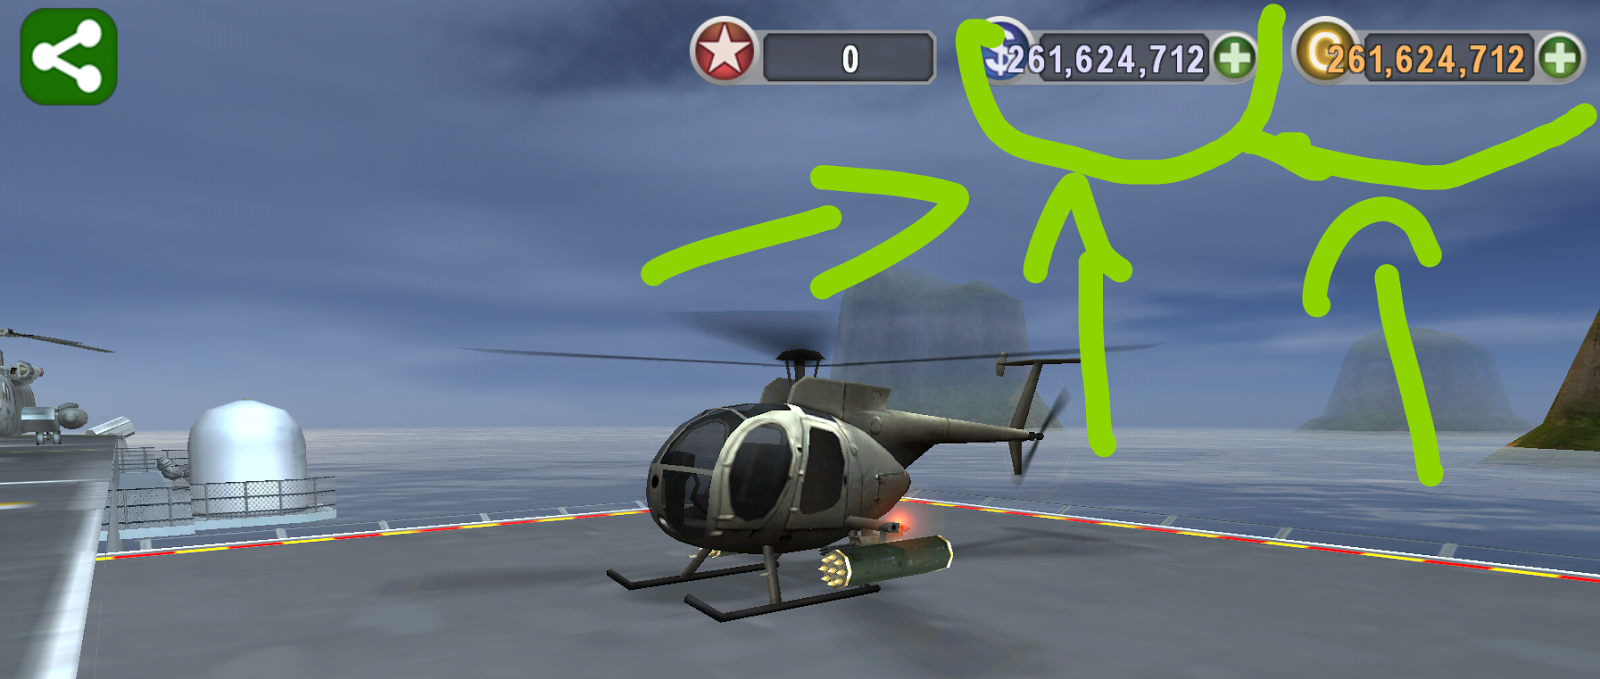 gunship battle helicopter 3d mod apk unlimited gold & money new version